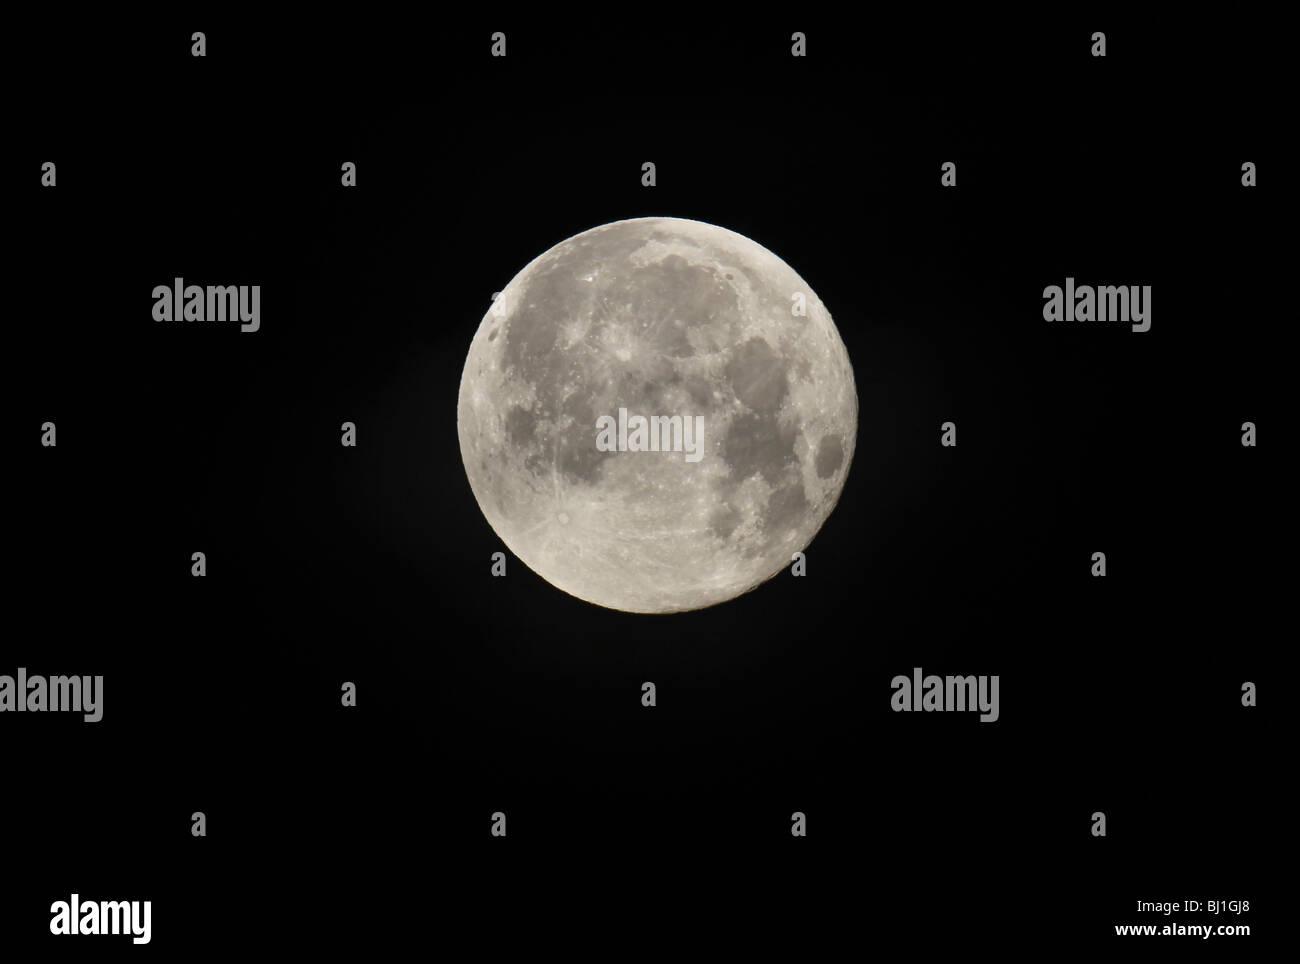 Full moon in closeup at black night - Stock Image